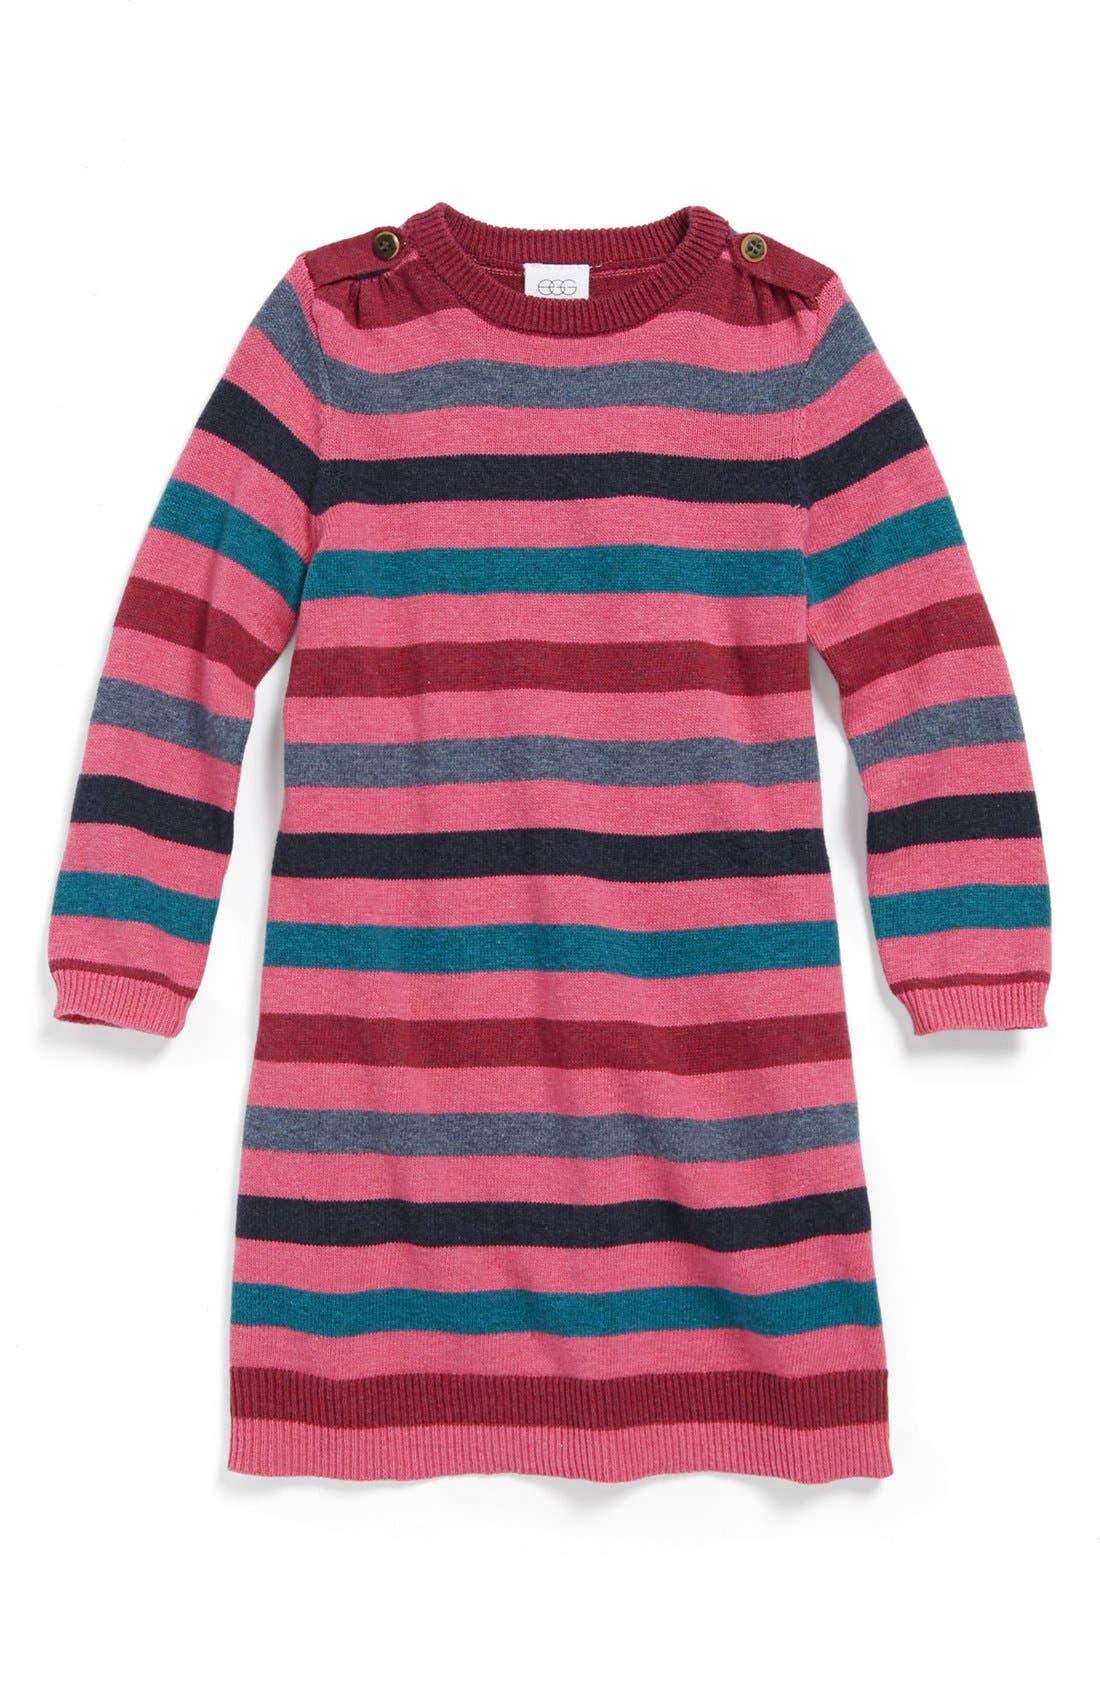 Alternate Image 1 Selected - egg by susan lazar Stripe Dress (Baby Girls)